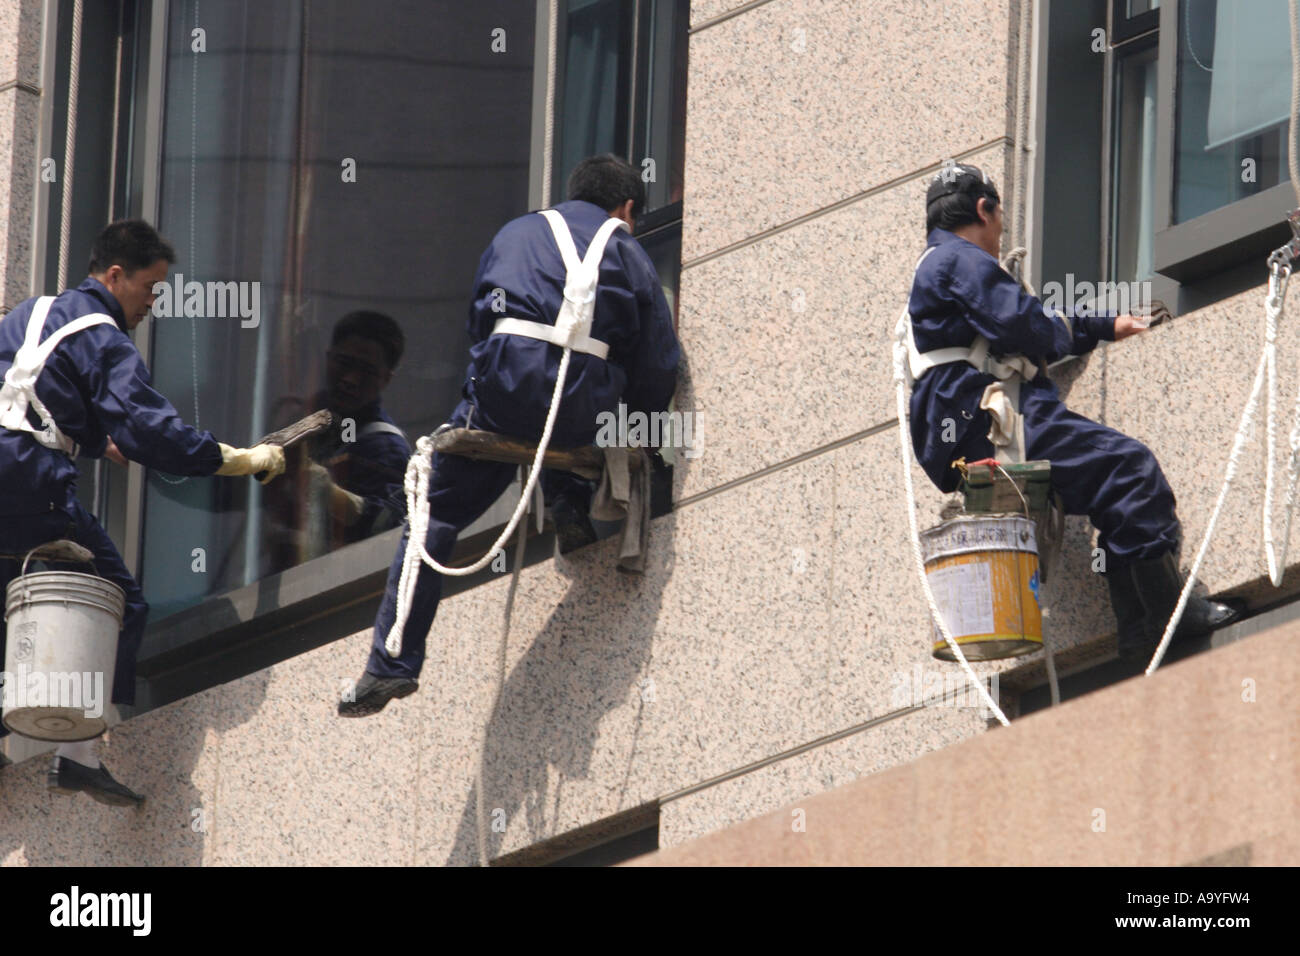 Window washing at Beijing Hotel - washers dangle from ropes - Stock Image